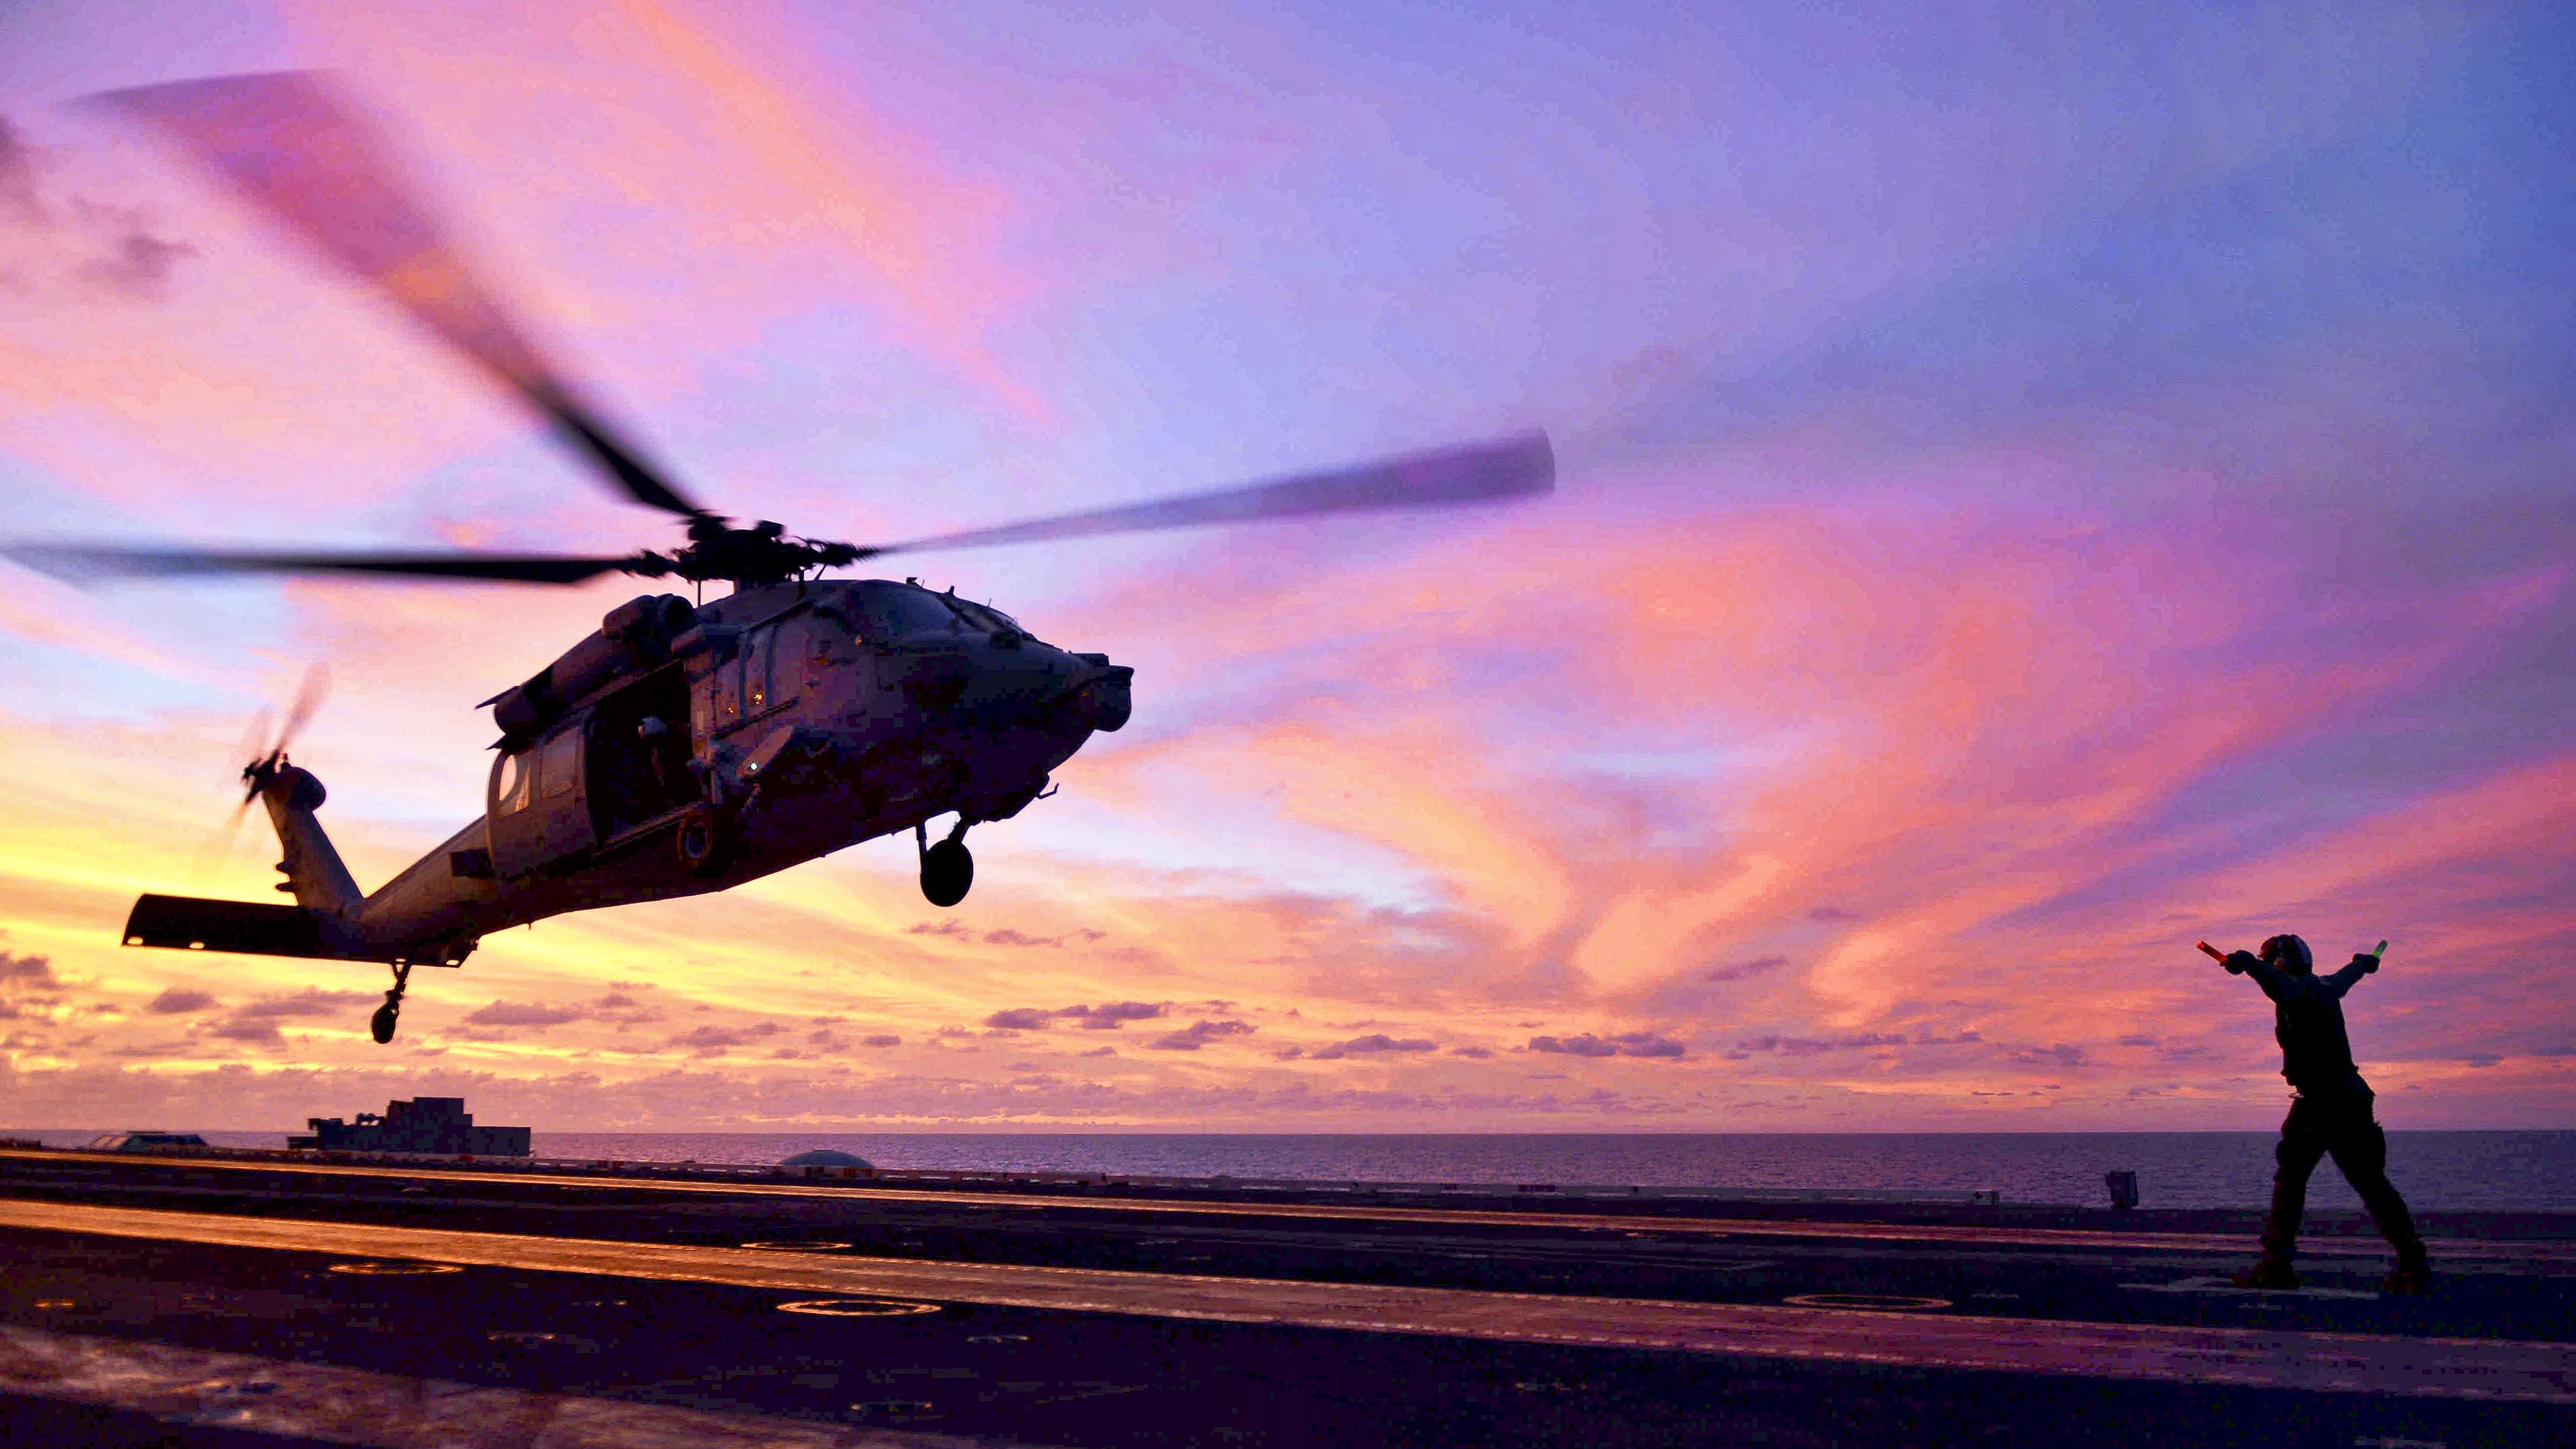 Military Helicopter 4k Hd Desktop Wallpaper For 4k Ultra: Sikorsky SH-60 Seahawk 4k Ultra HD Wallpaper